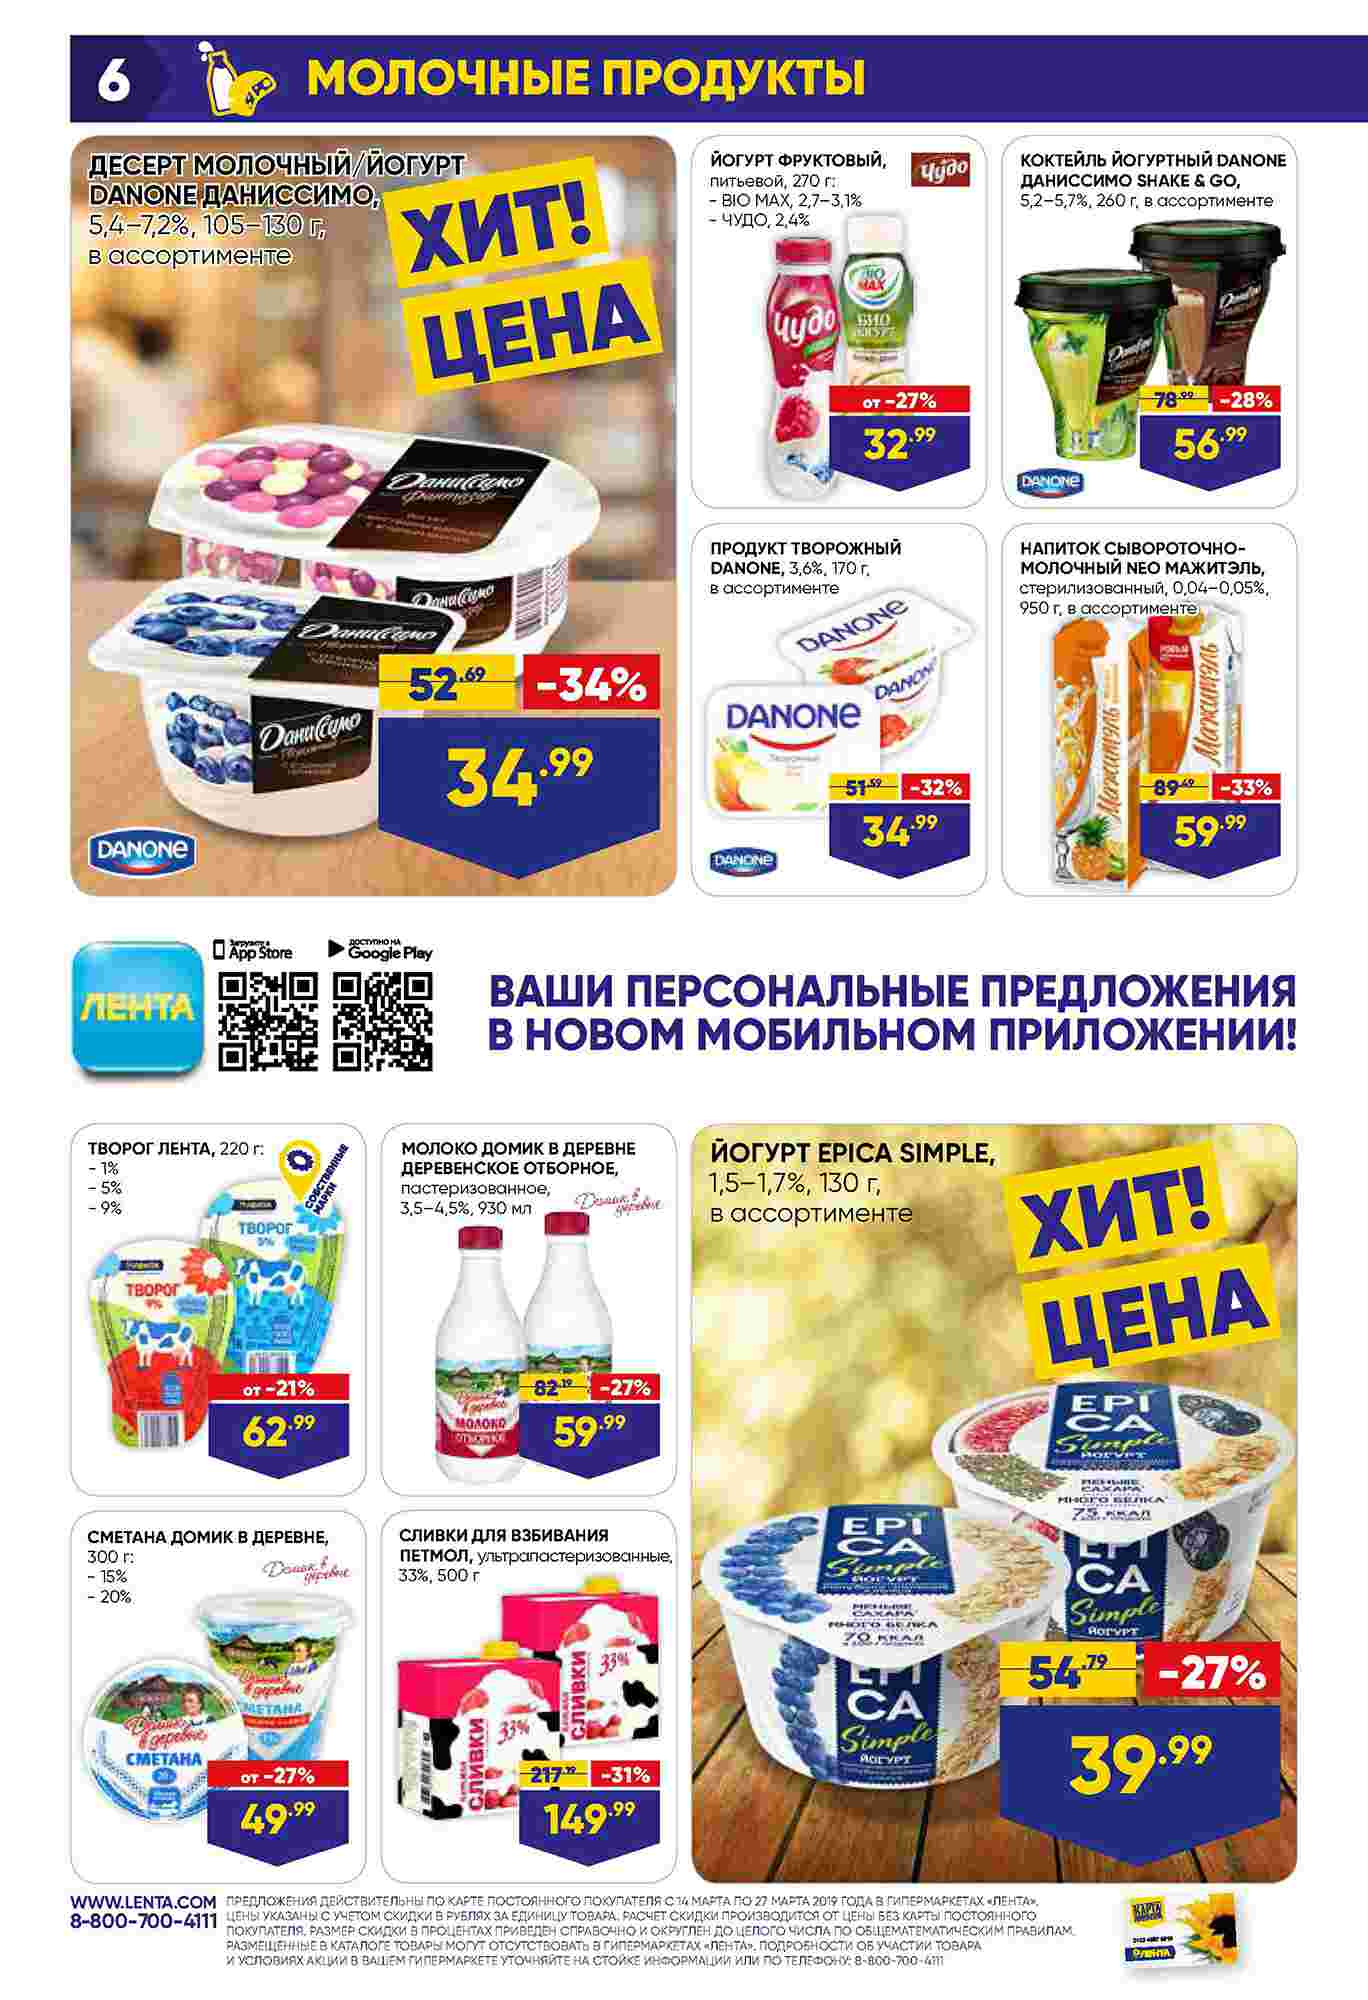 Каталог Лента гипермаркет 14-27.03.2019 стр. - 0001 - 0006